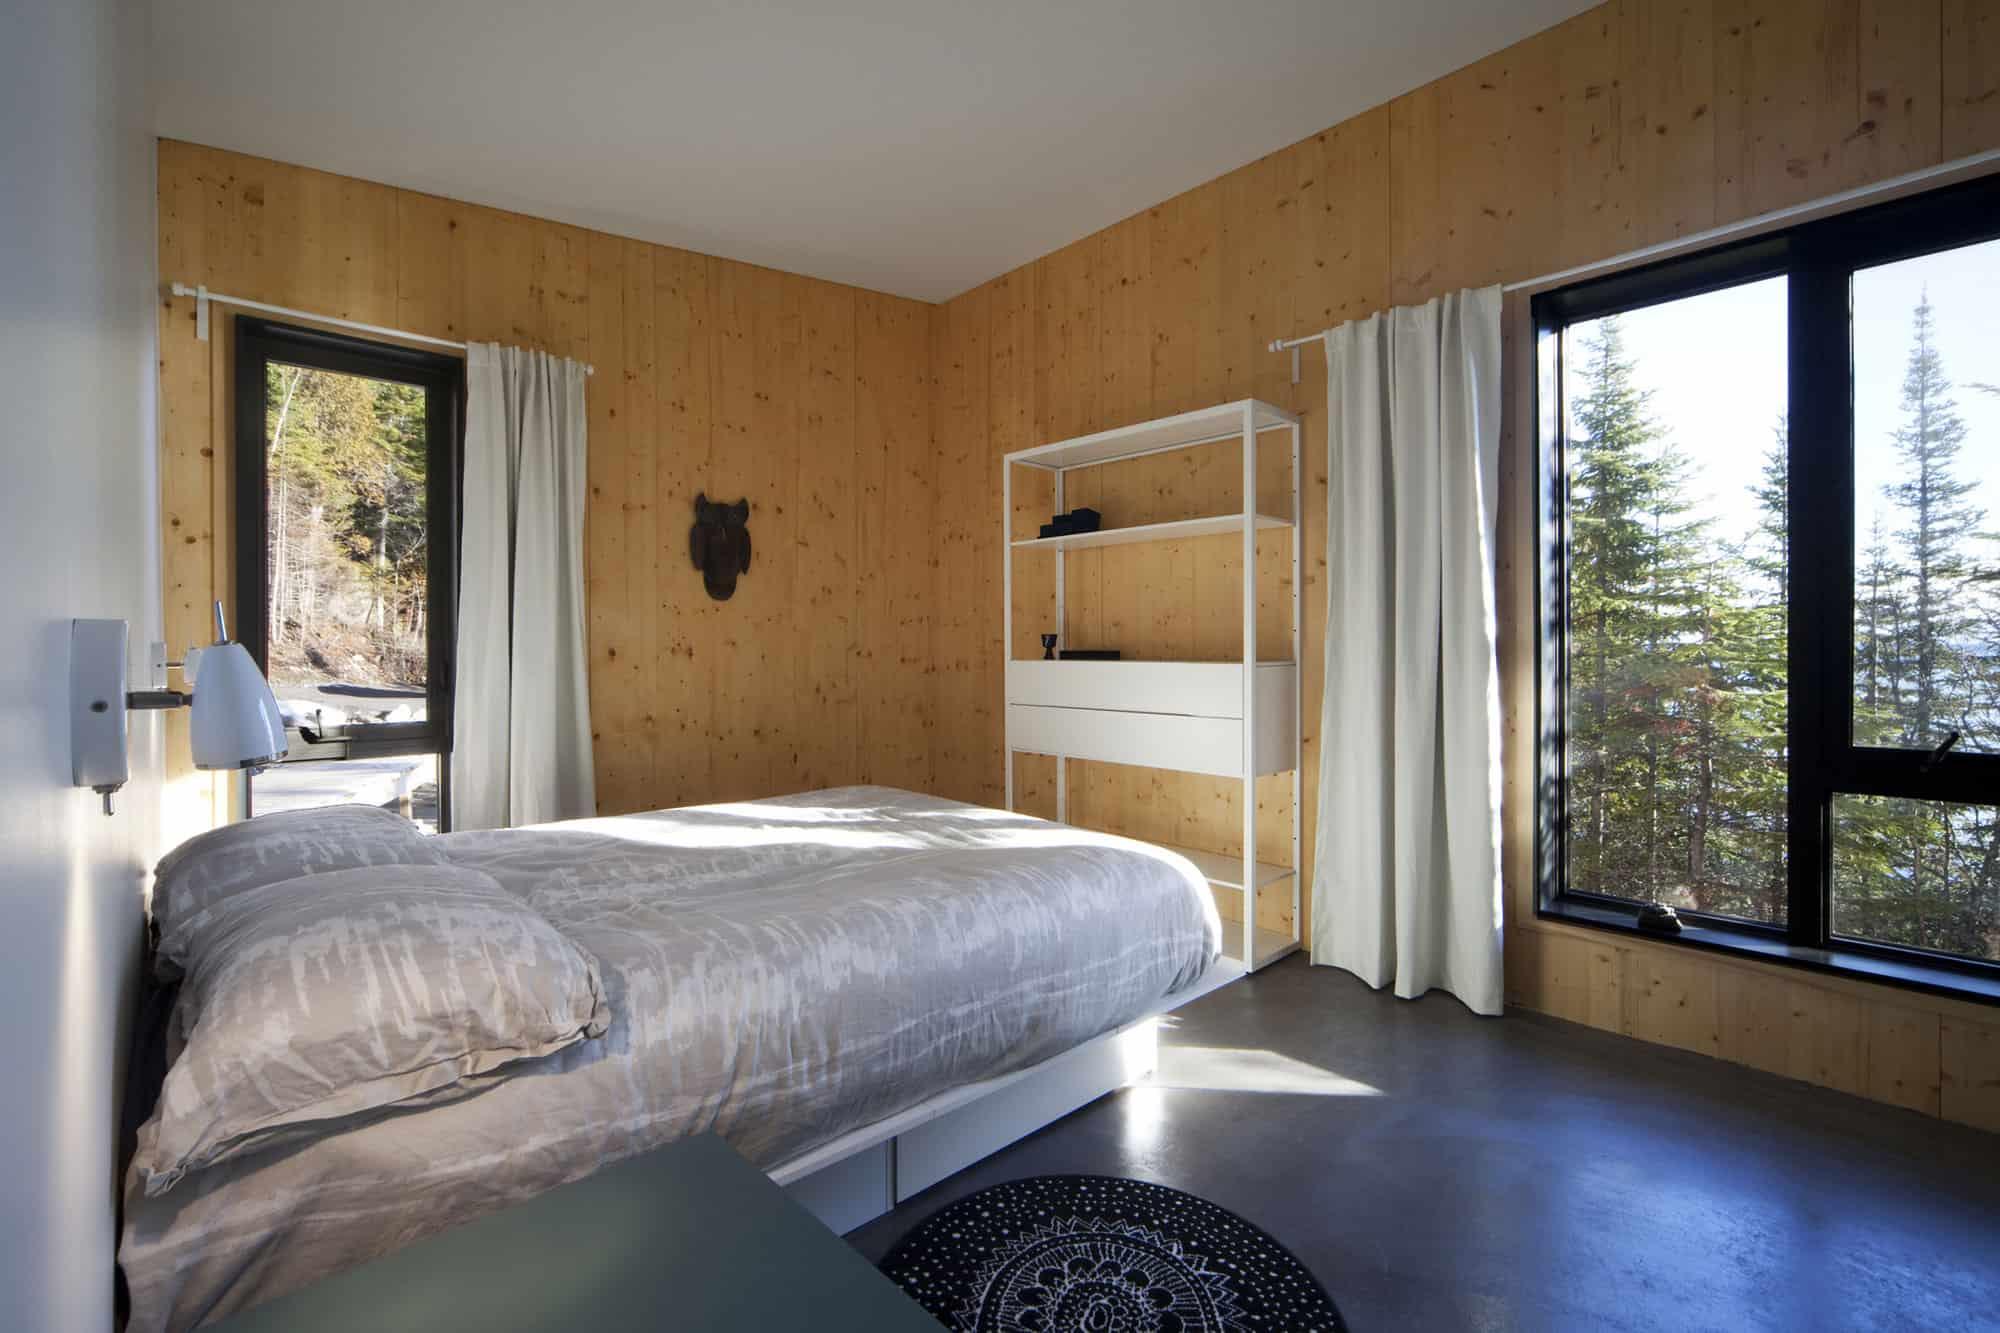 Architecture Casa Designs a Home Perched on the Rocks in Saint-Siméon